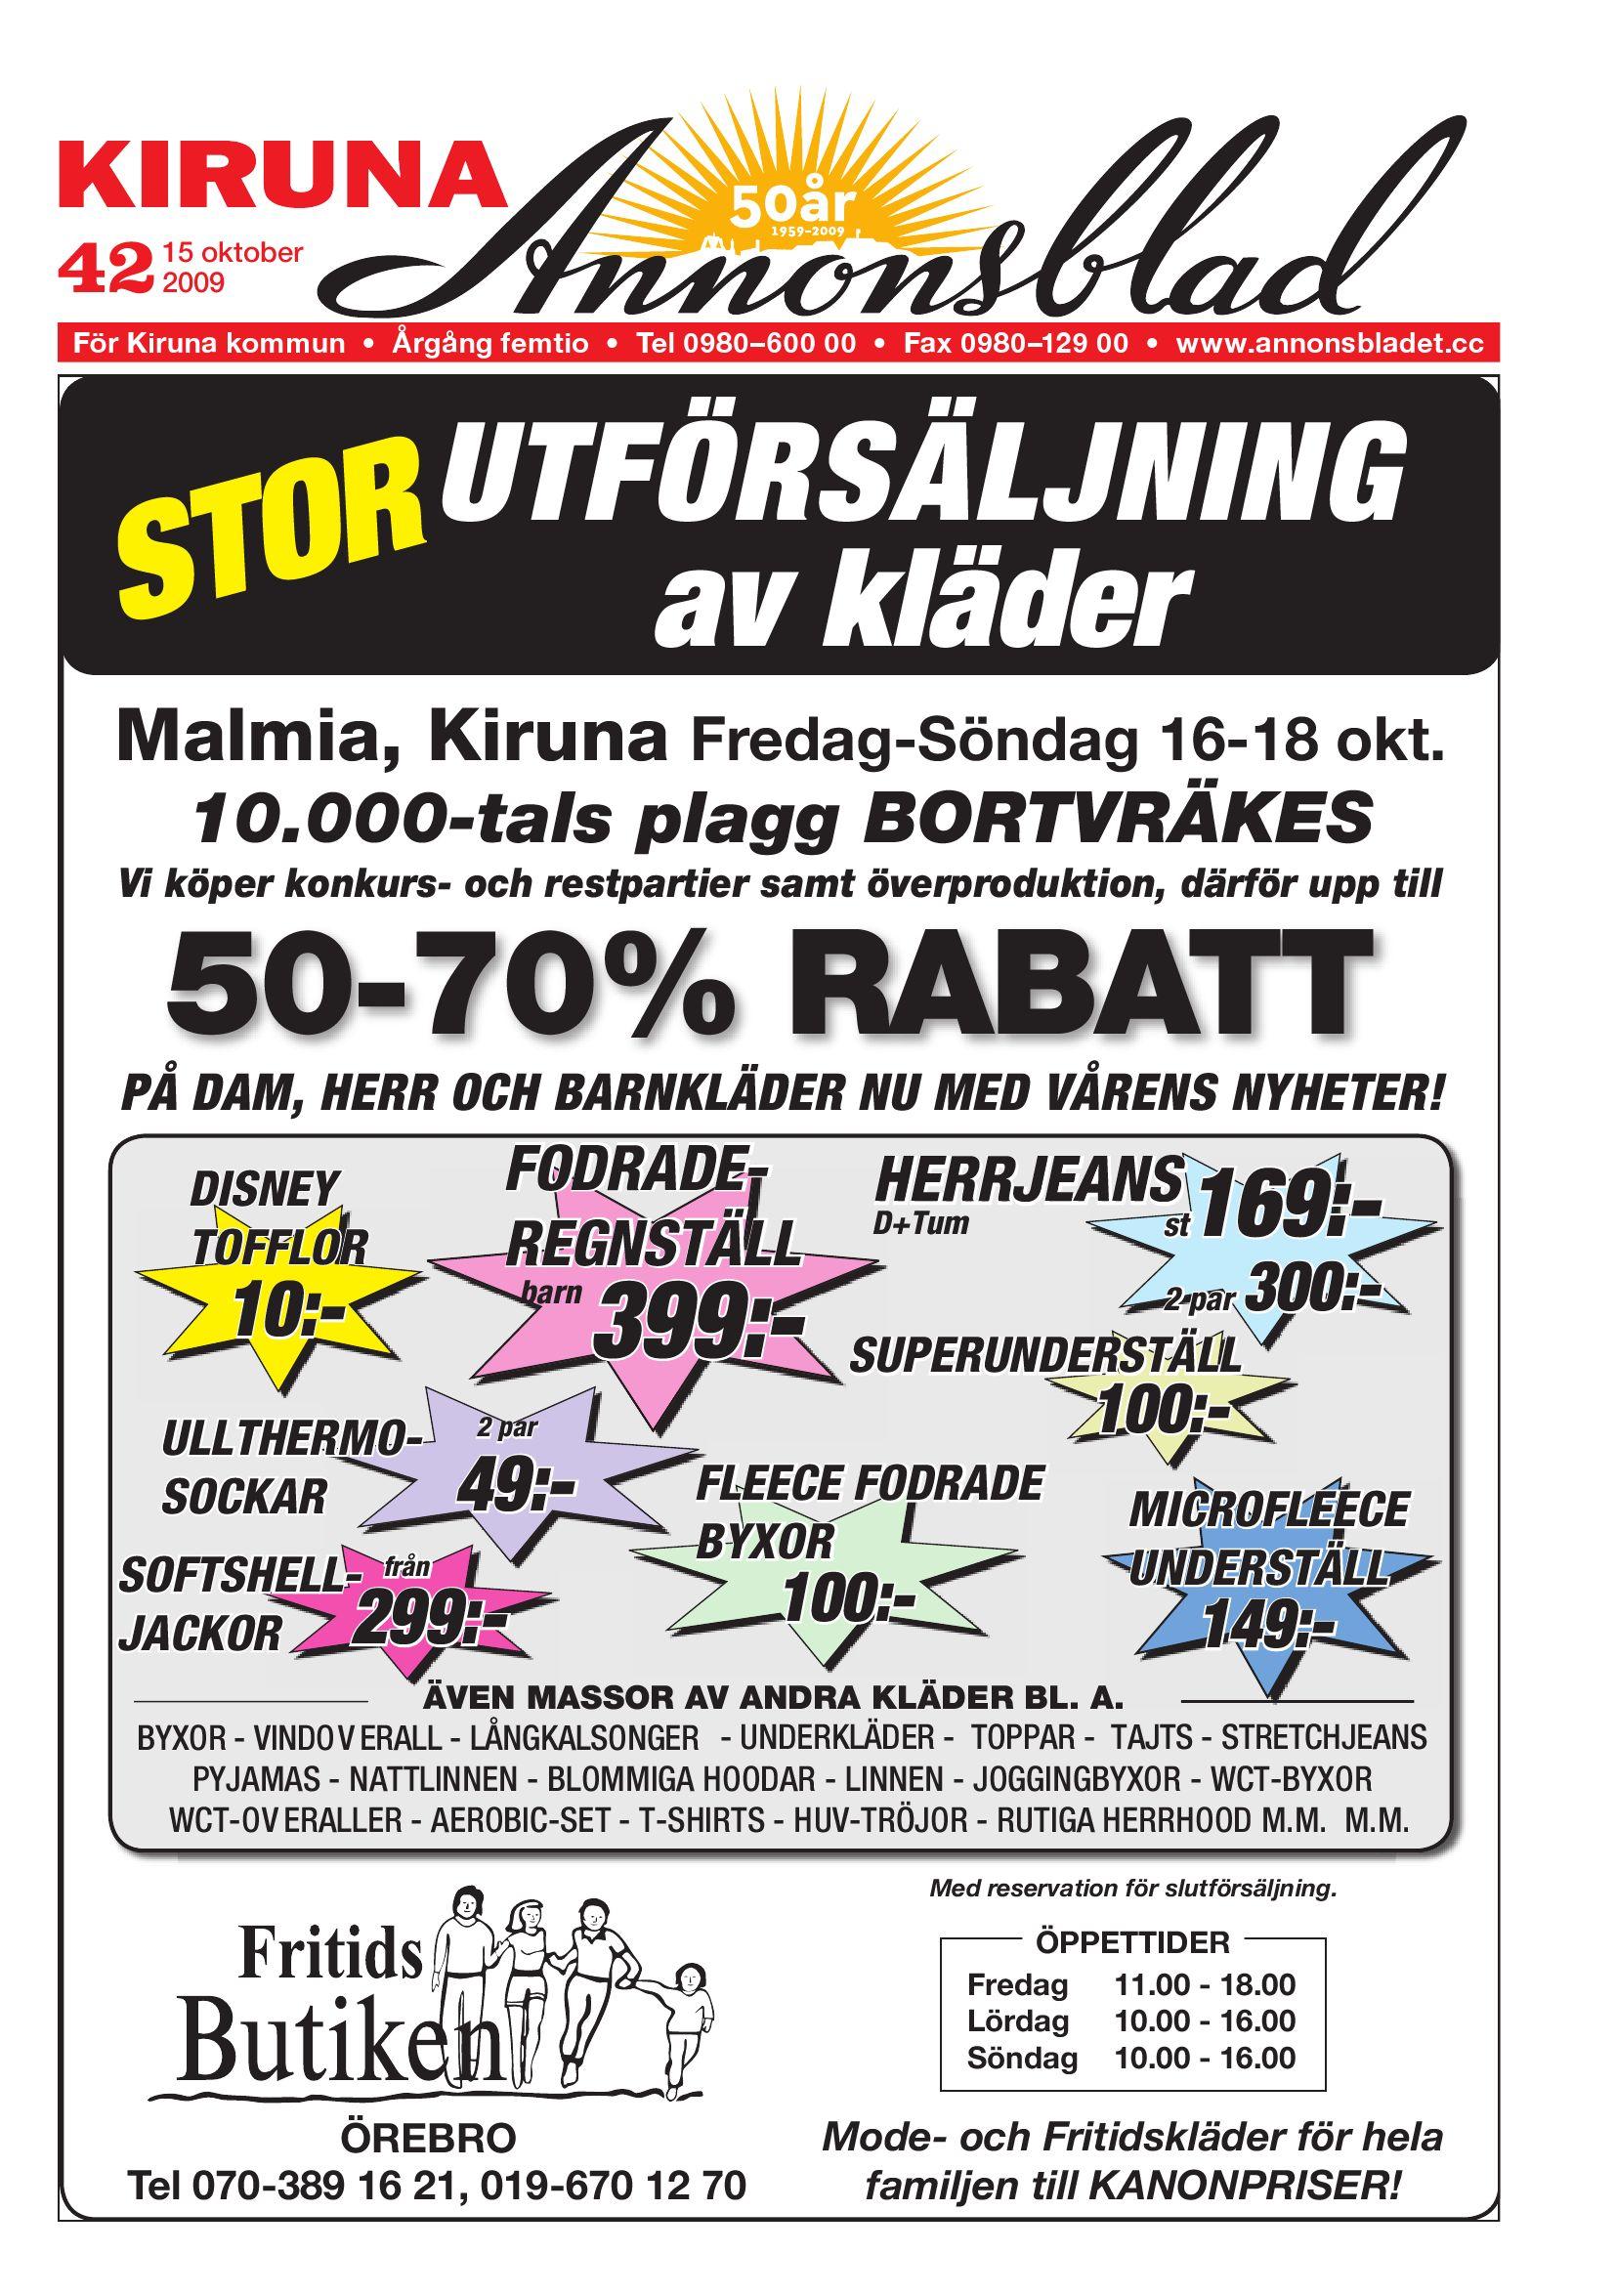 Kiruna Annonsblad 2009 v.42 by Svenska Civildatalogerna AB - issuu 0b7913204bc62